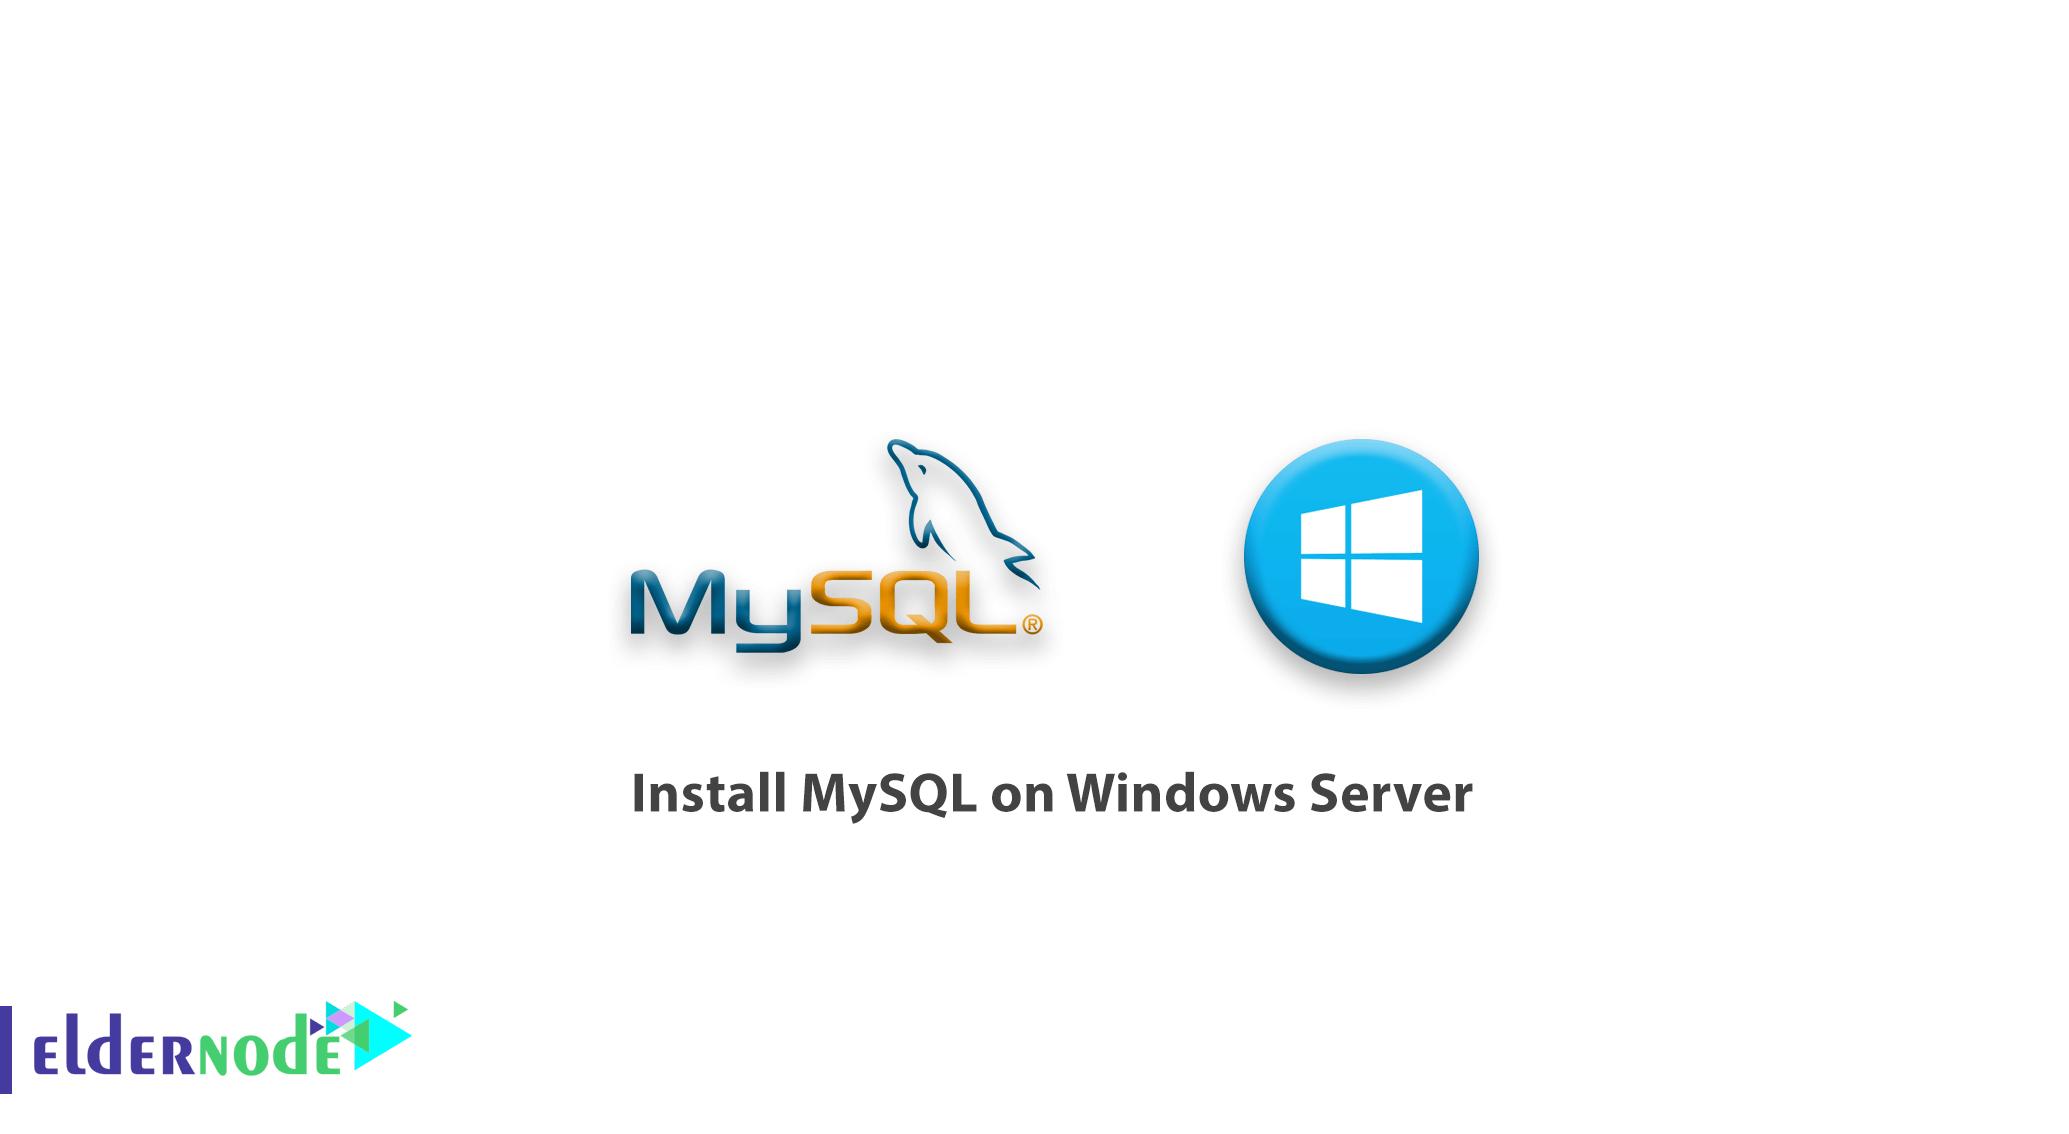 How to install MySQL on Windows Server